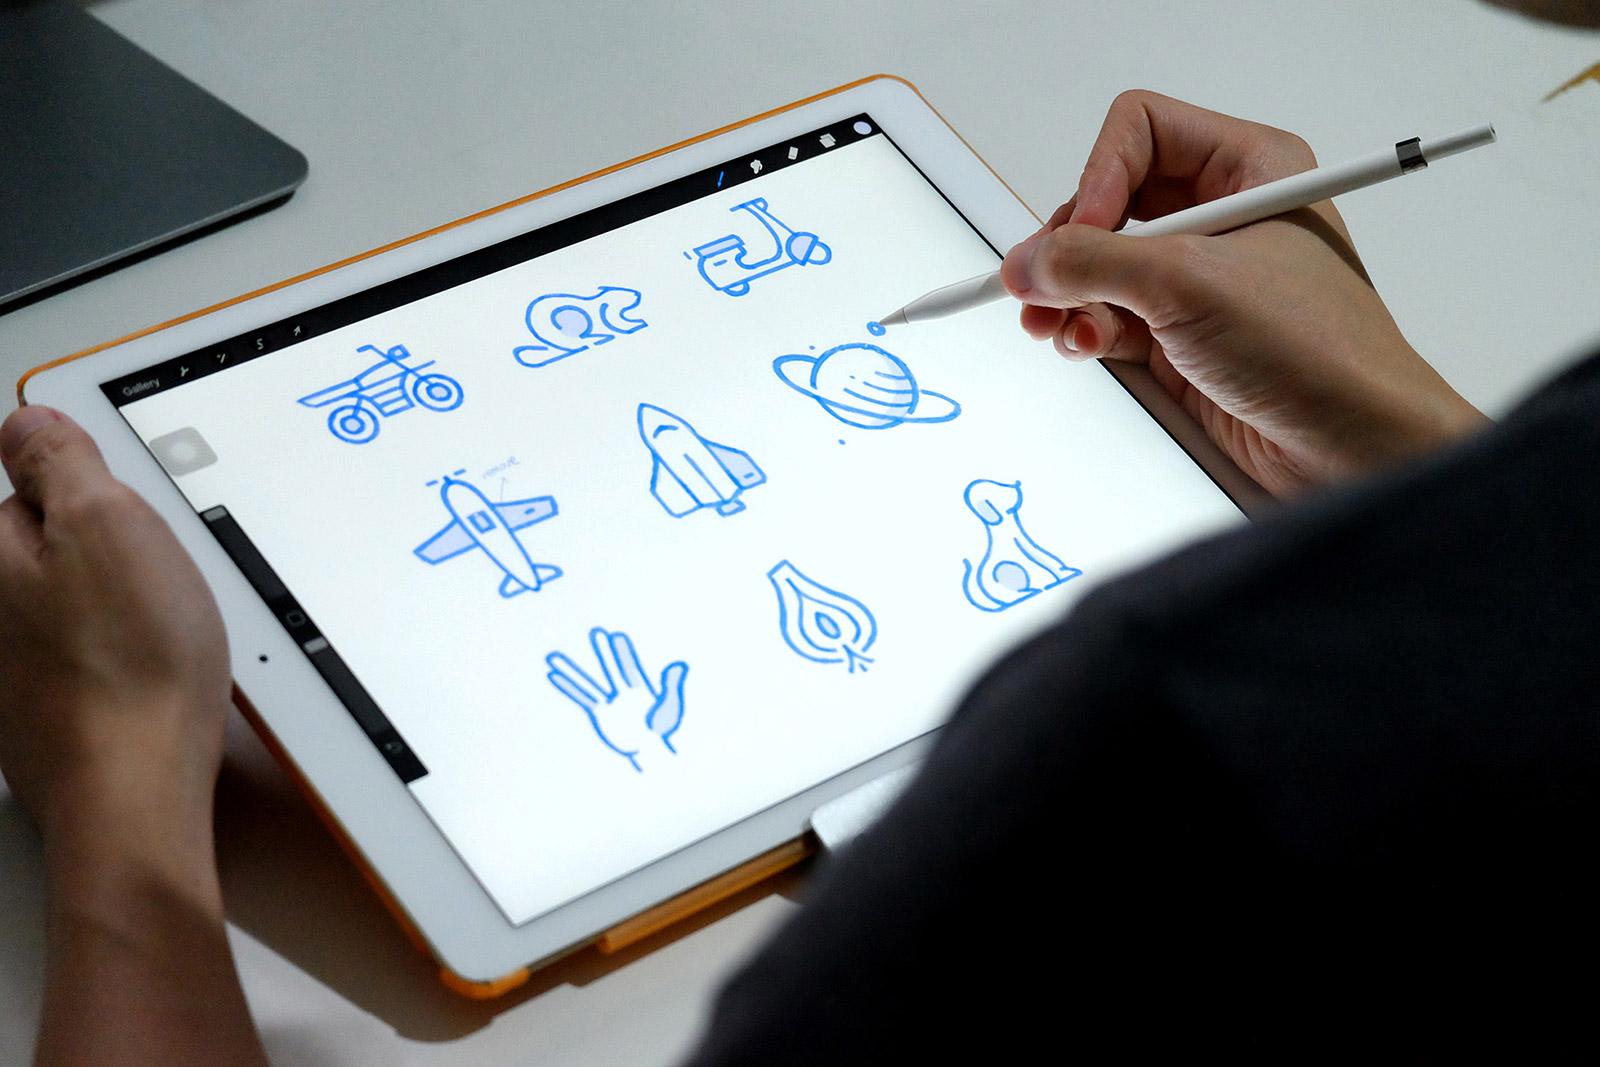 ipad-pro icons sketching